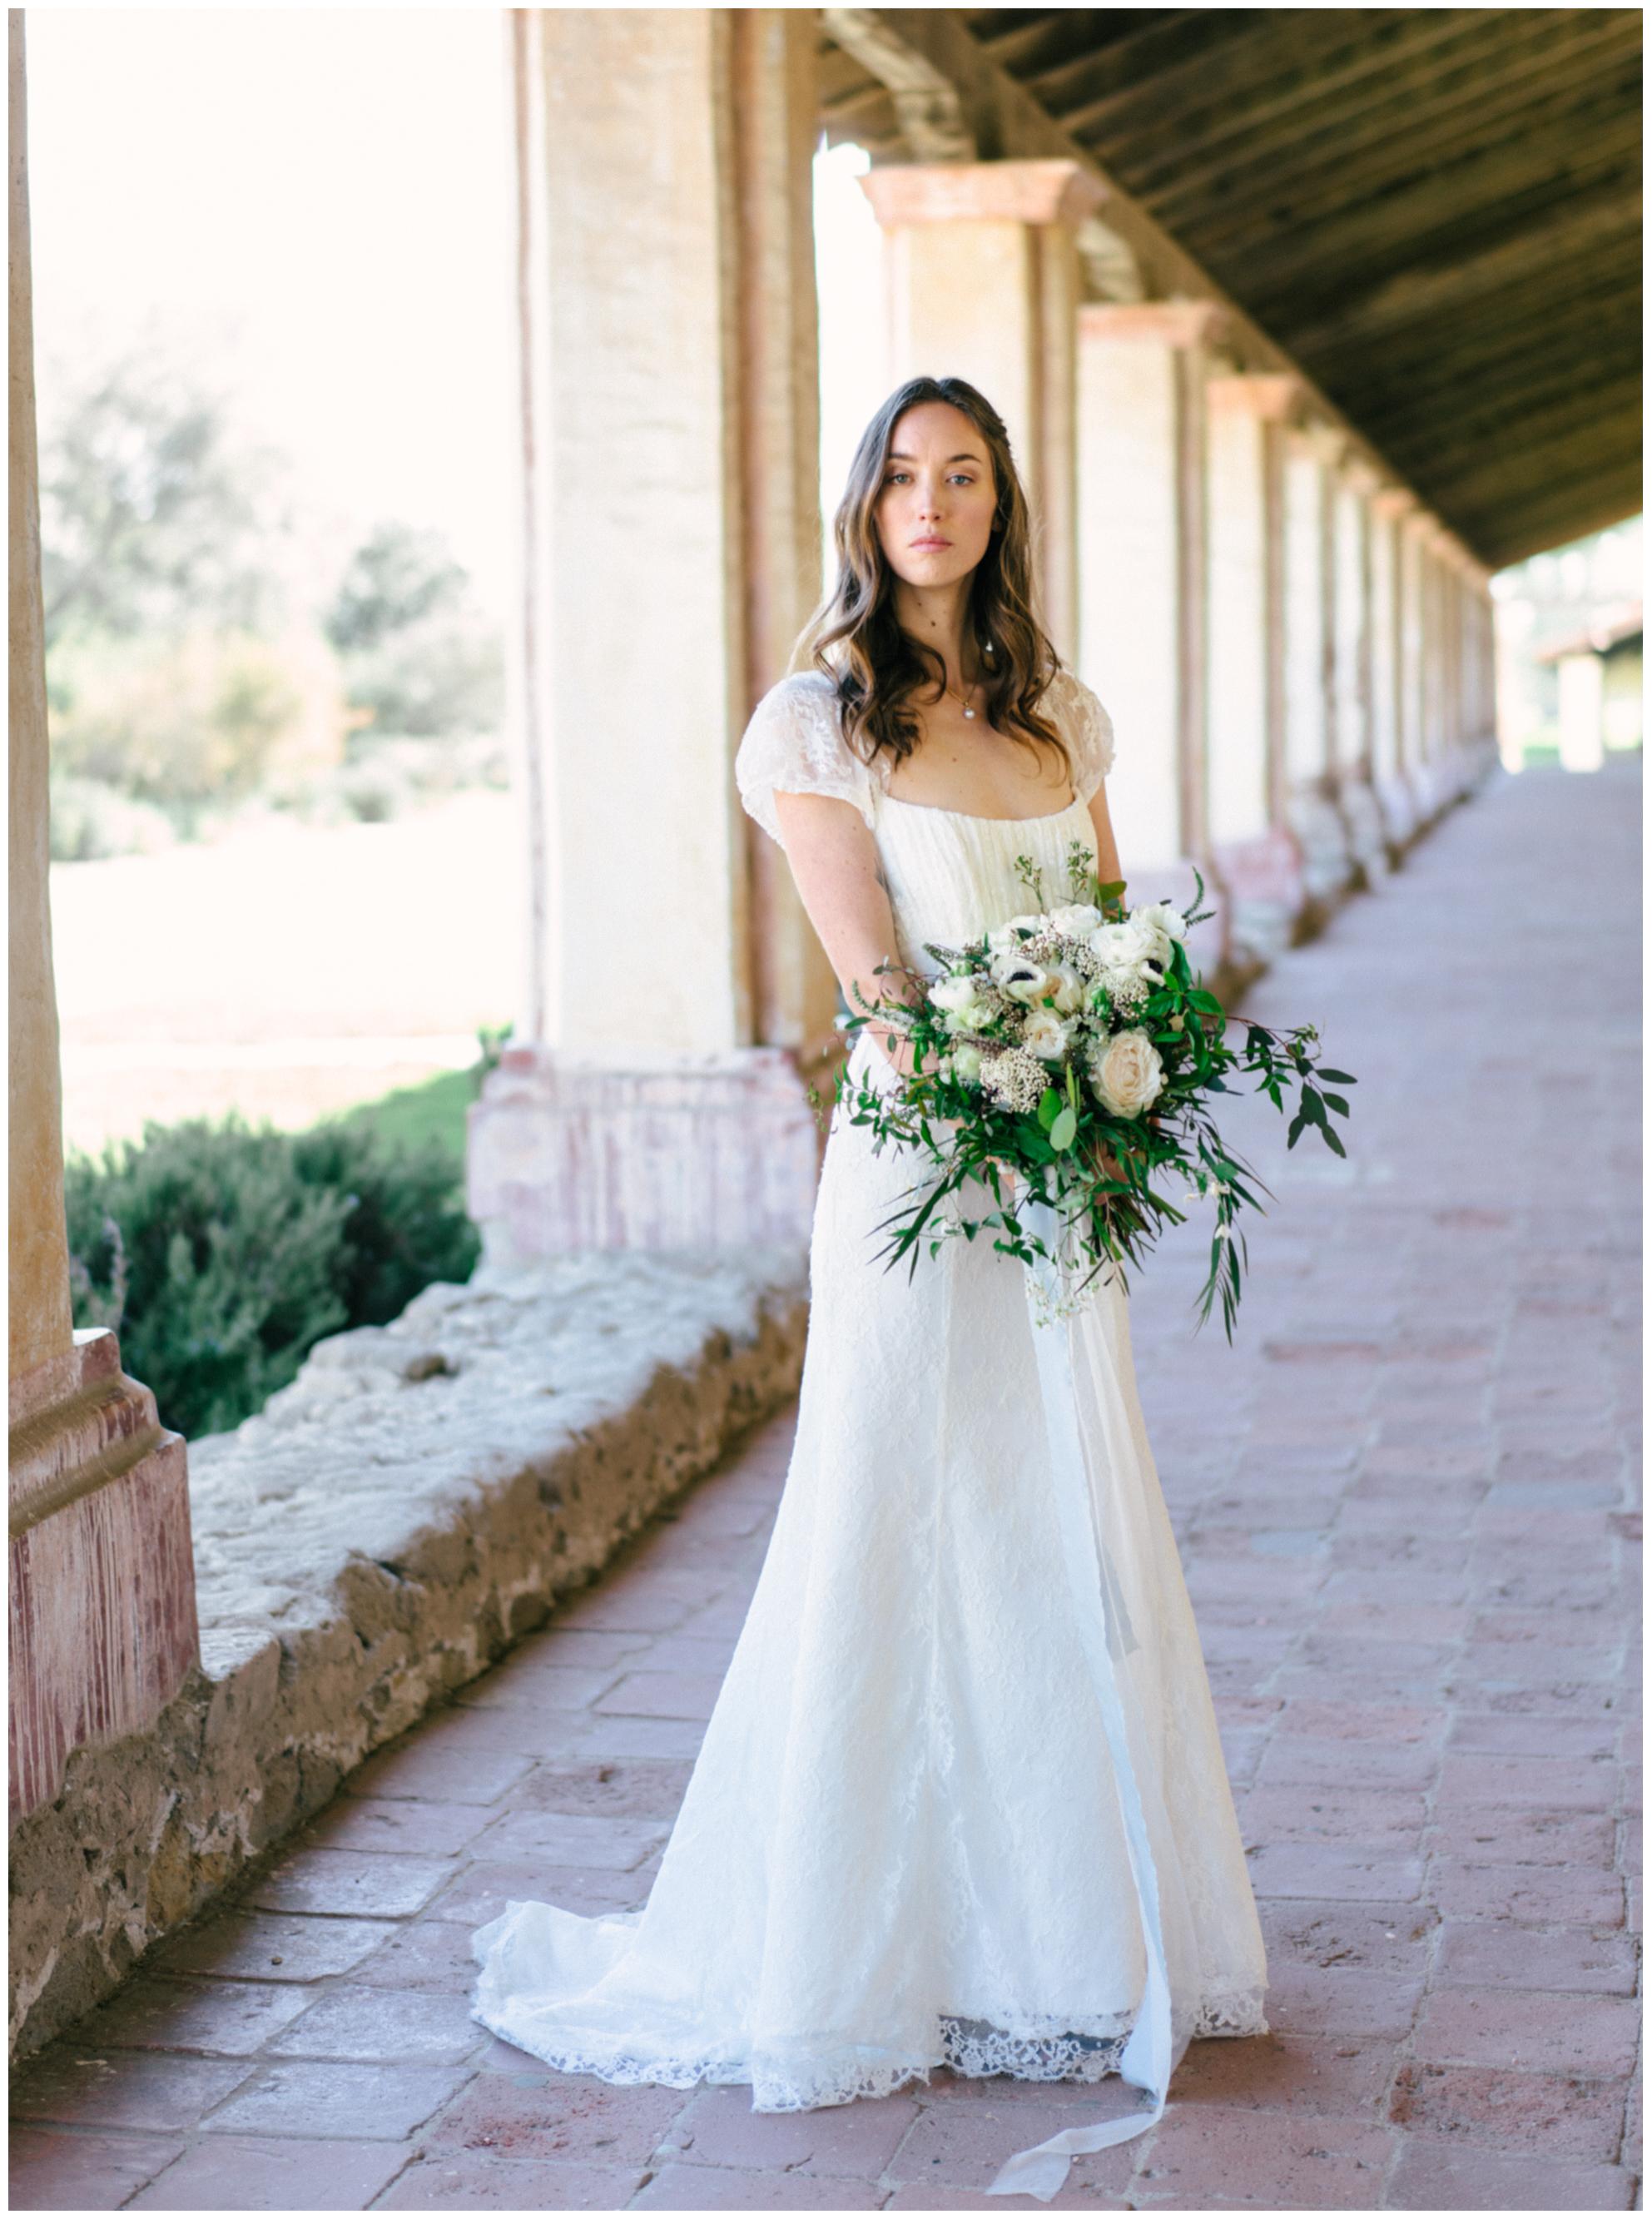 Santa_Barbara_Wedding_Photographer_Pinnel_Photography_La_Purisima_Mission-014.jpg